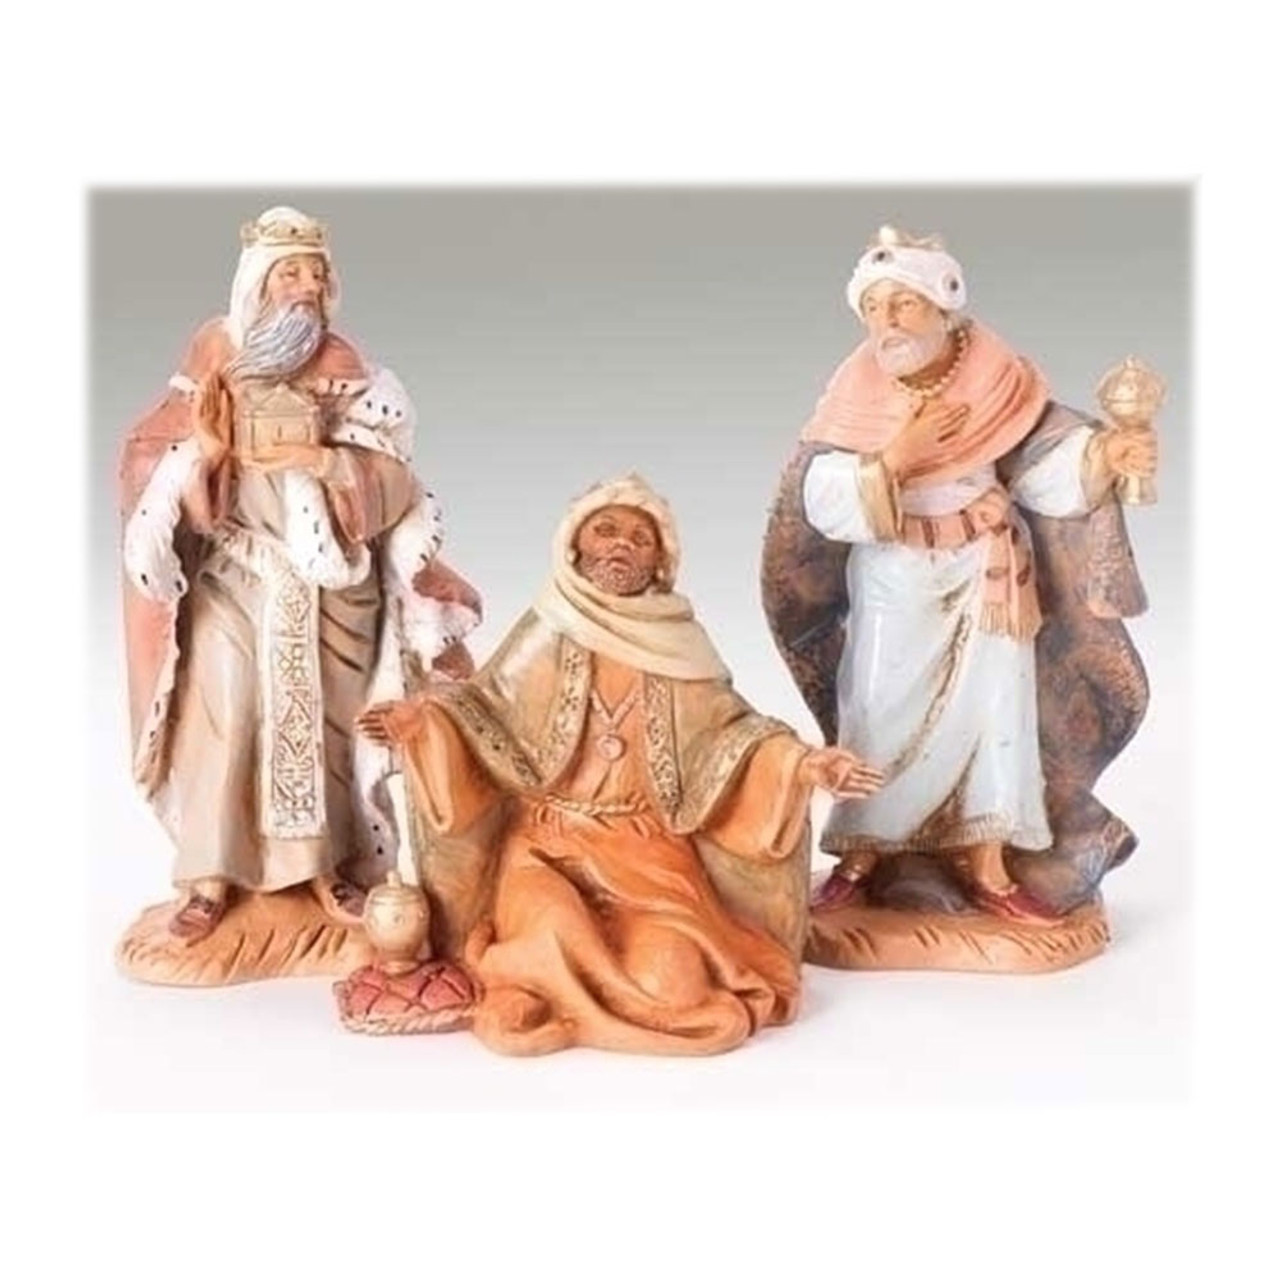 "5"" Scale Fontanini Three Kings Nativity Figures"